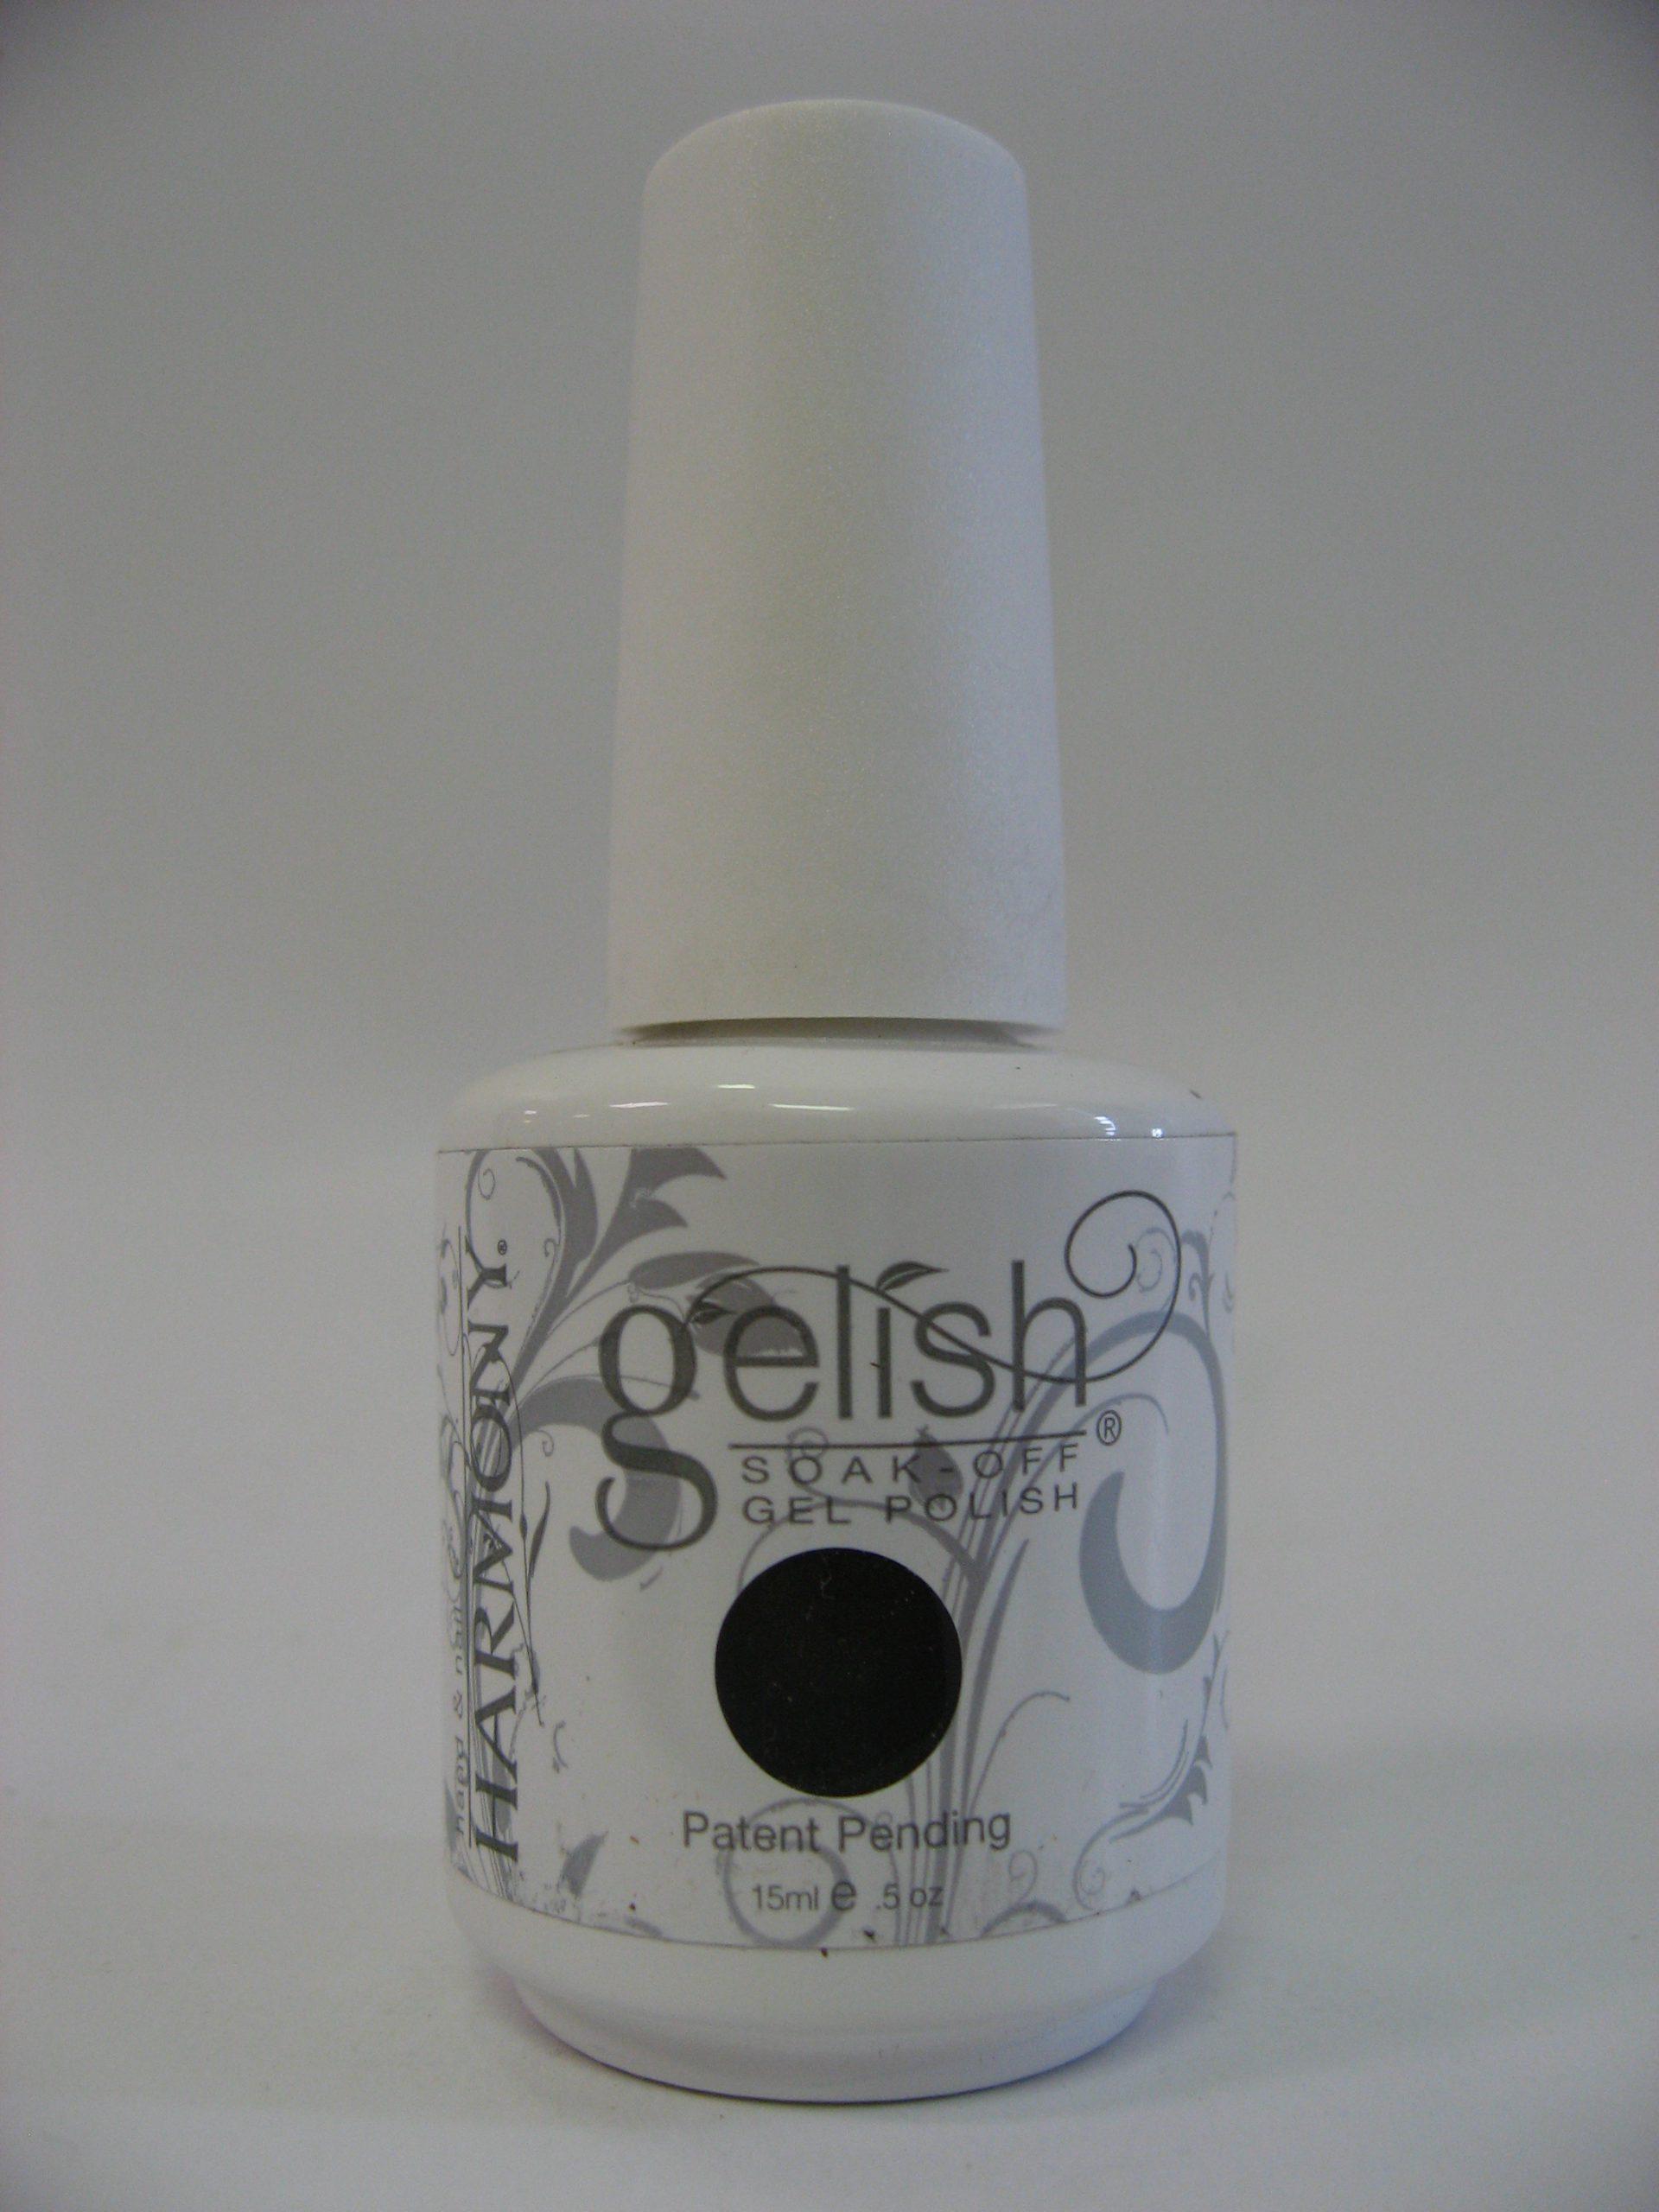 Gelish Soak Off Gel Polish - 1424 - Welcome to the Masquerade